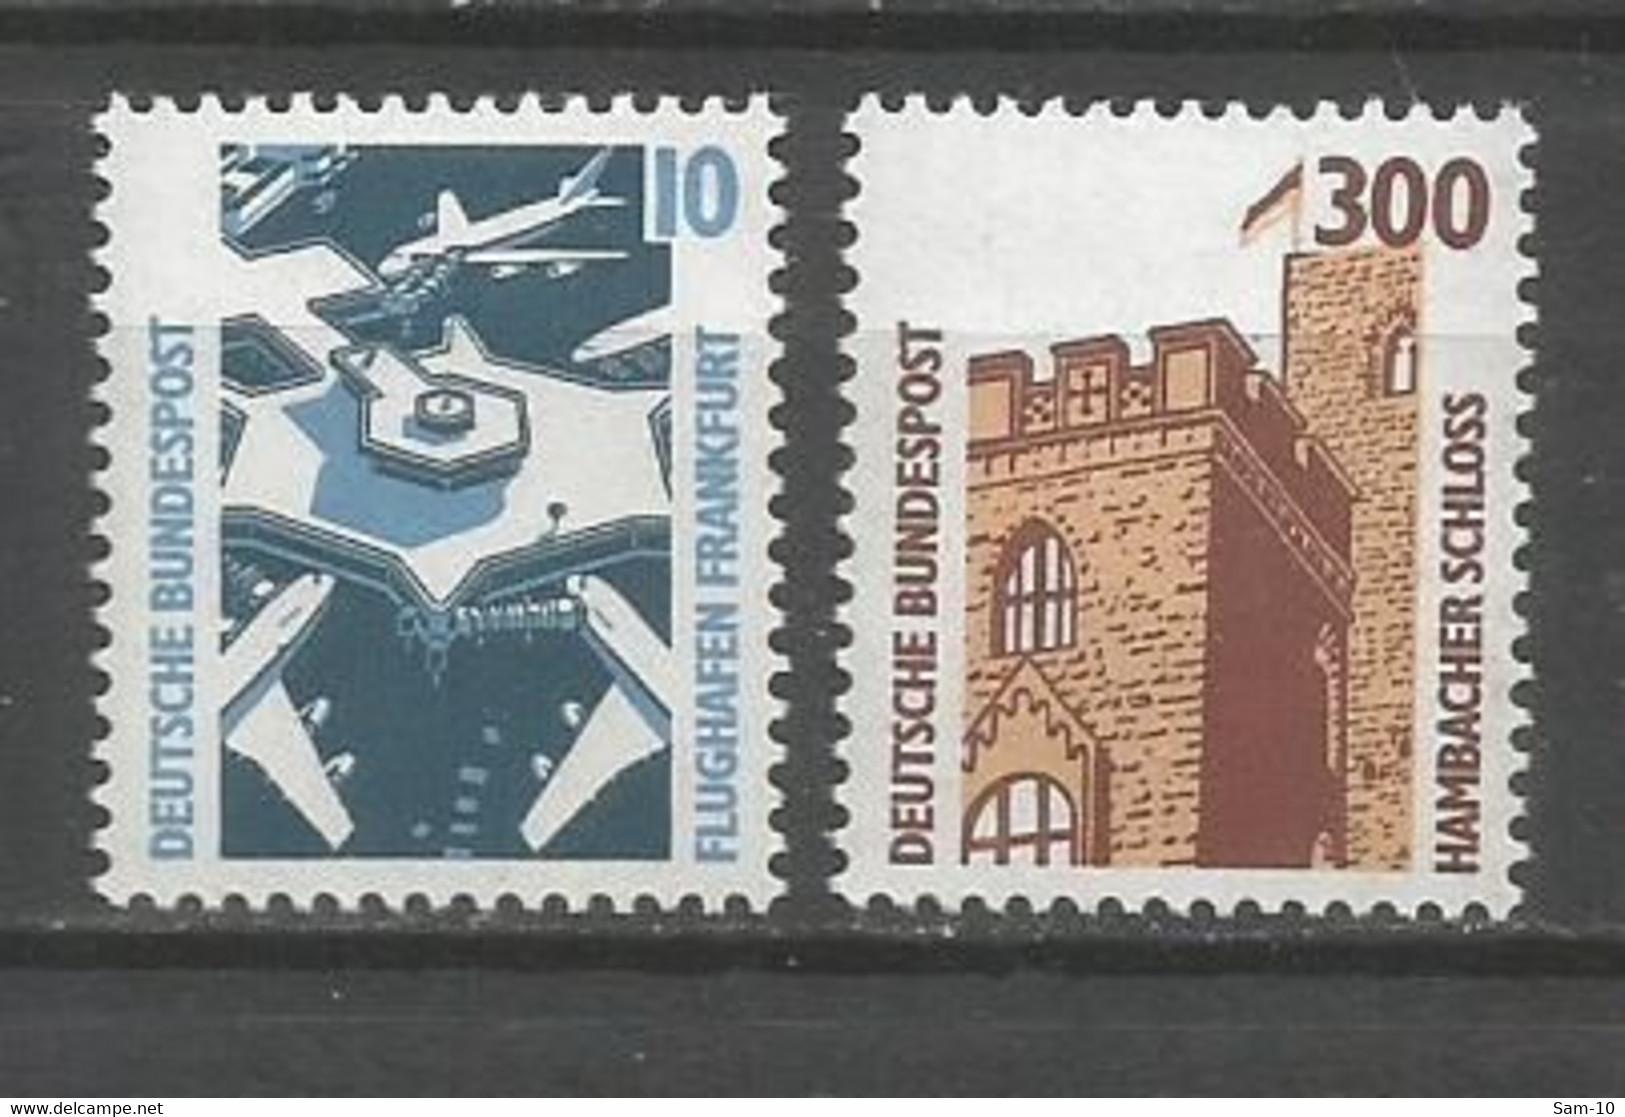 Timbre Allemagne Fédérale Neuf **  N 1179 / 1180 - Ungebraucht